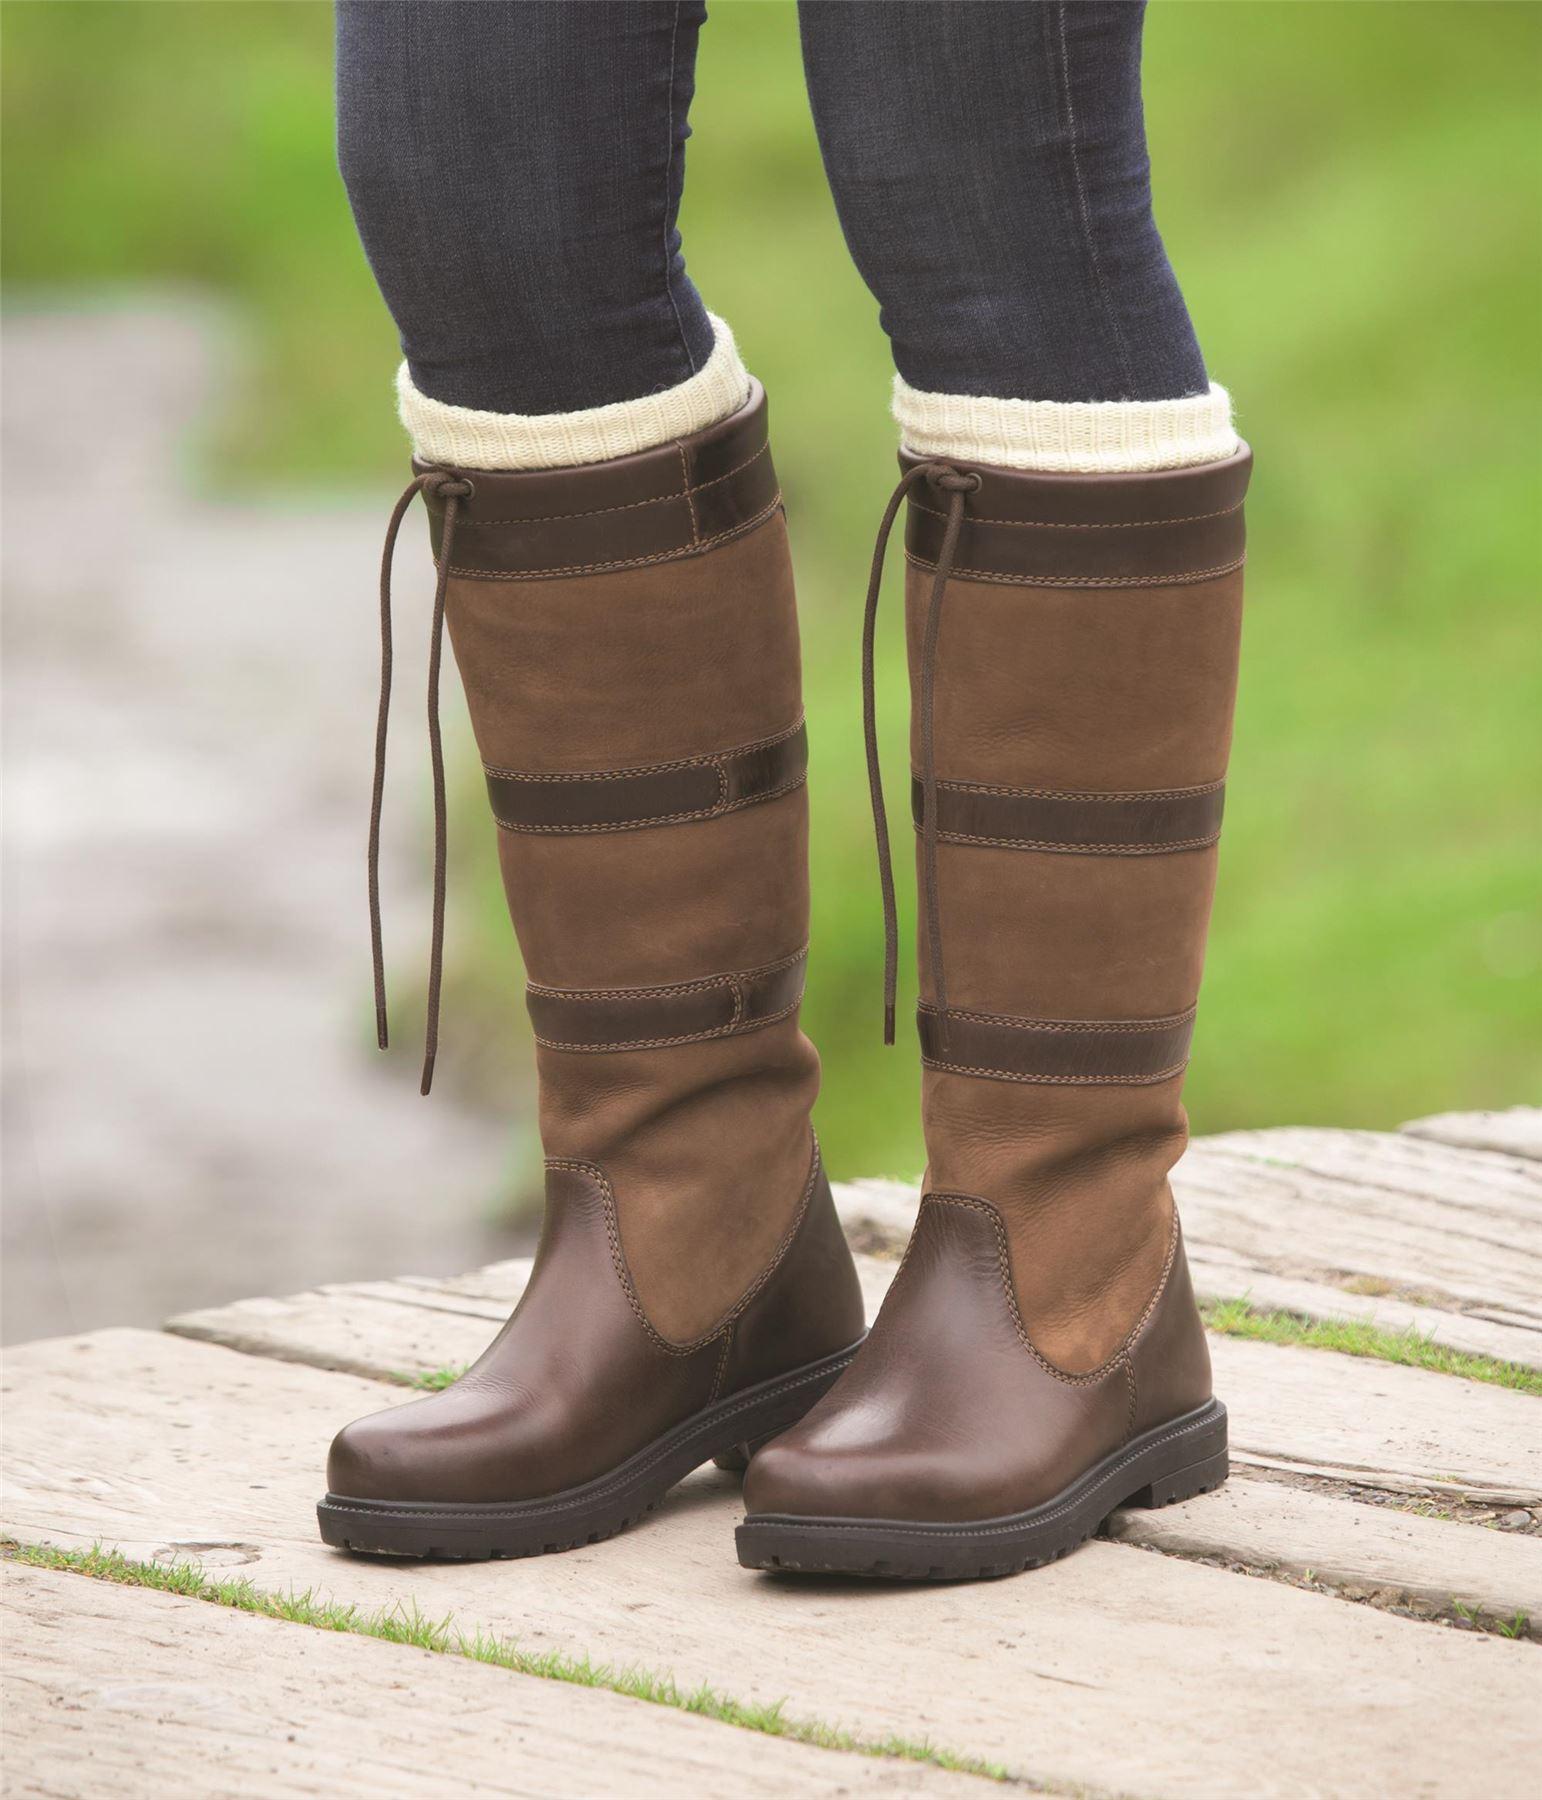 Outdoor - / Riding boots FXqXqJ